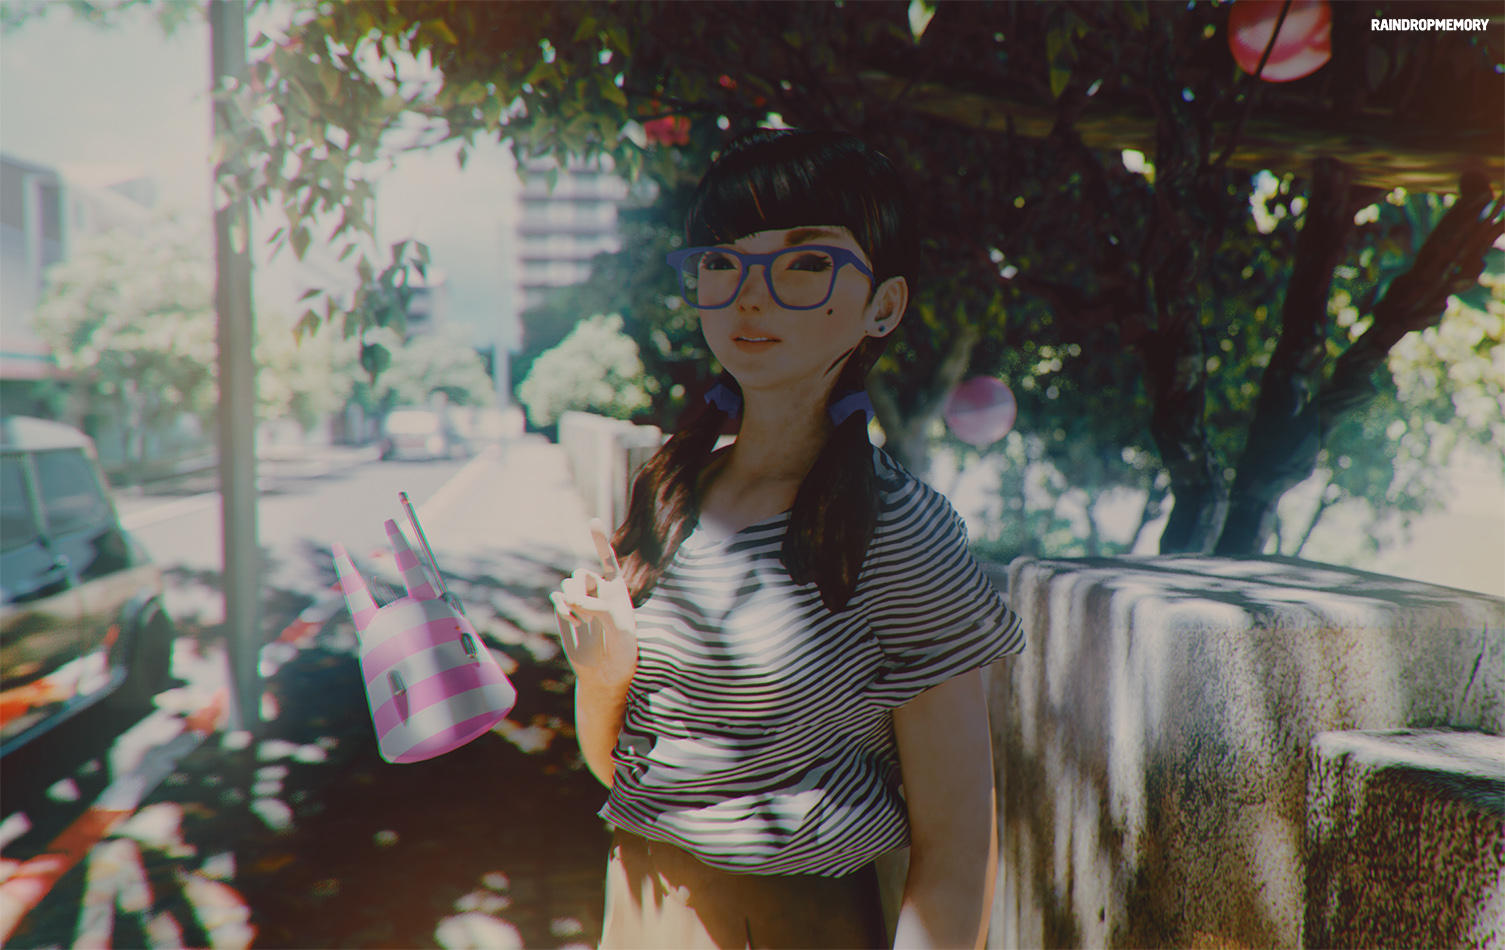 UndertheTree glassesgirl-by-raindropmemory by Raindropmemory